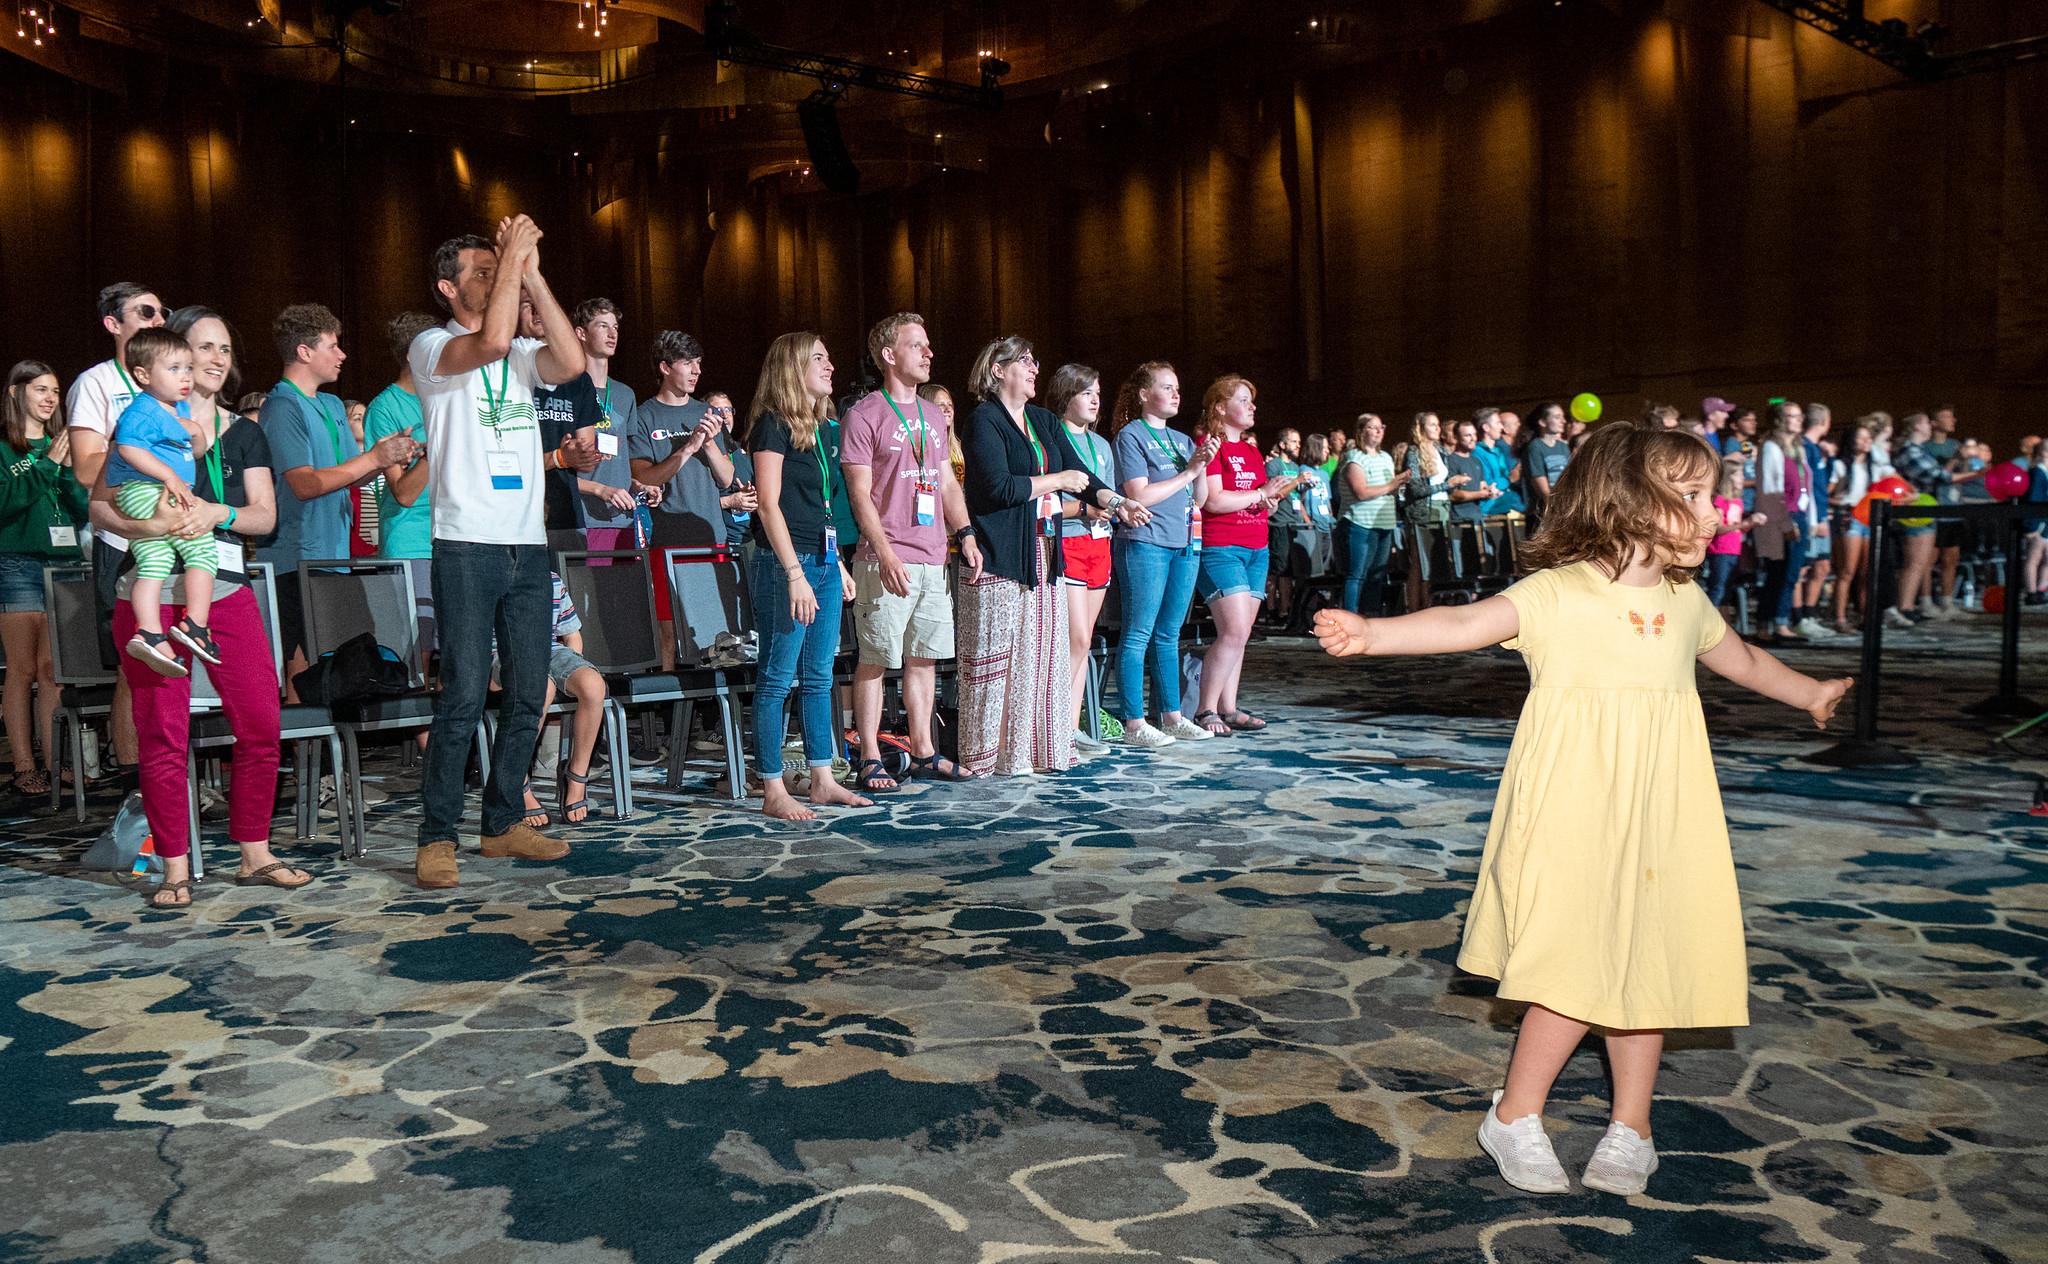 A girl dances to the music of the worship band in Duke Energy Convention Center. — Ken Krehbiel/MC USA